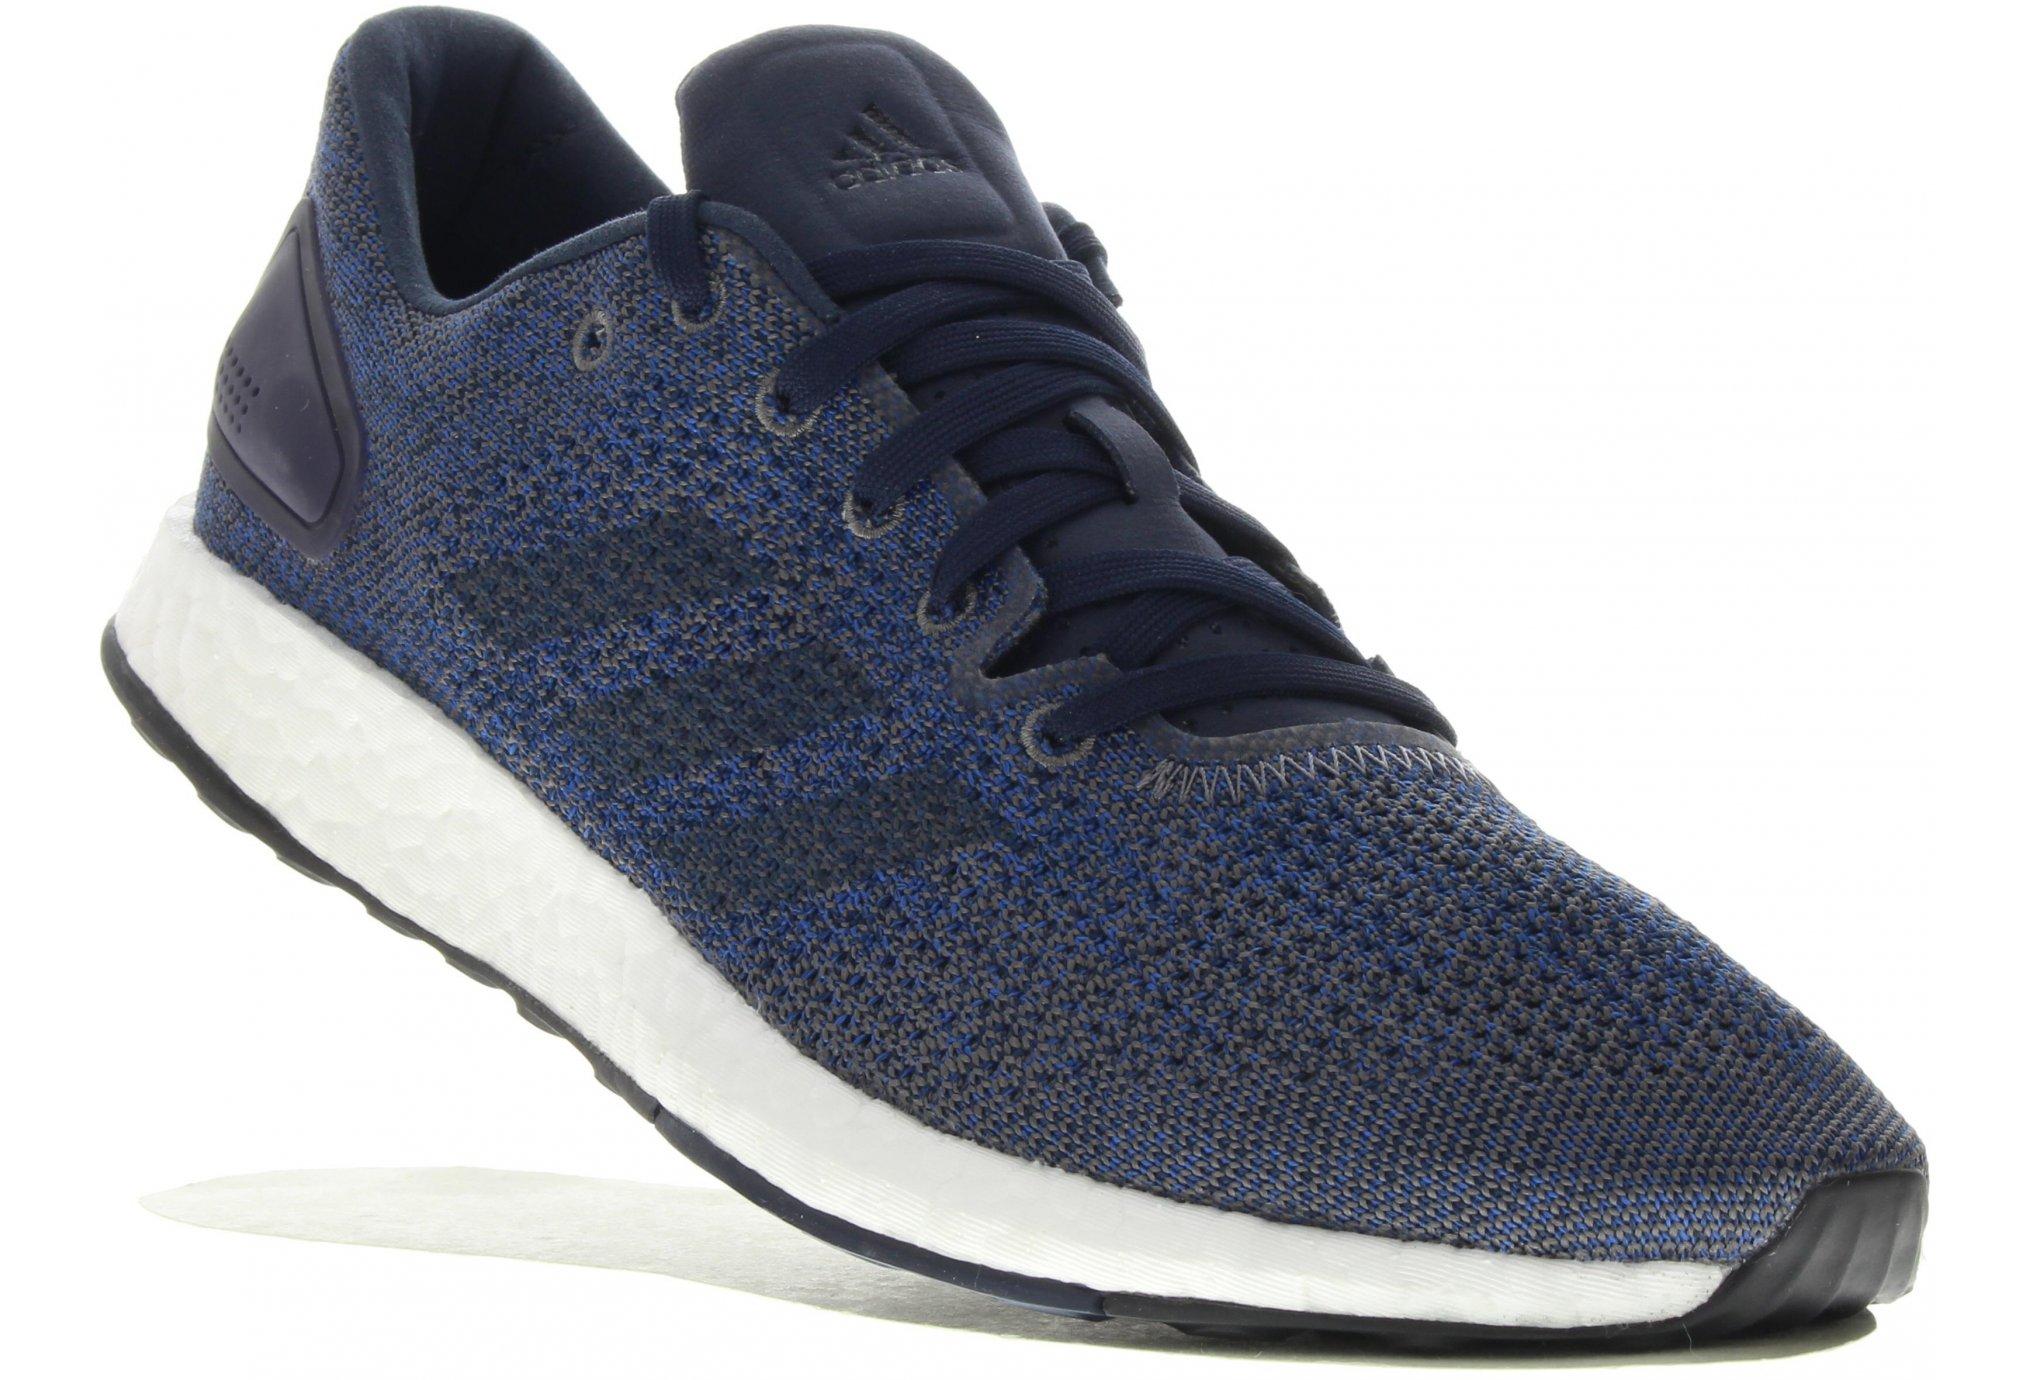 Adidas Pureboost dpr m diététique chaussures homme